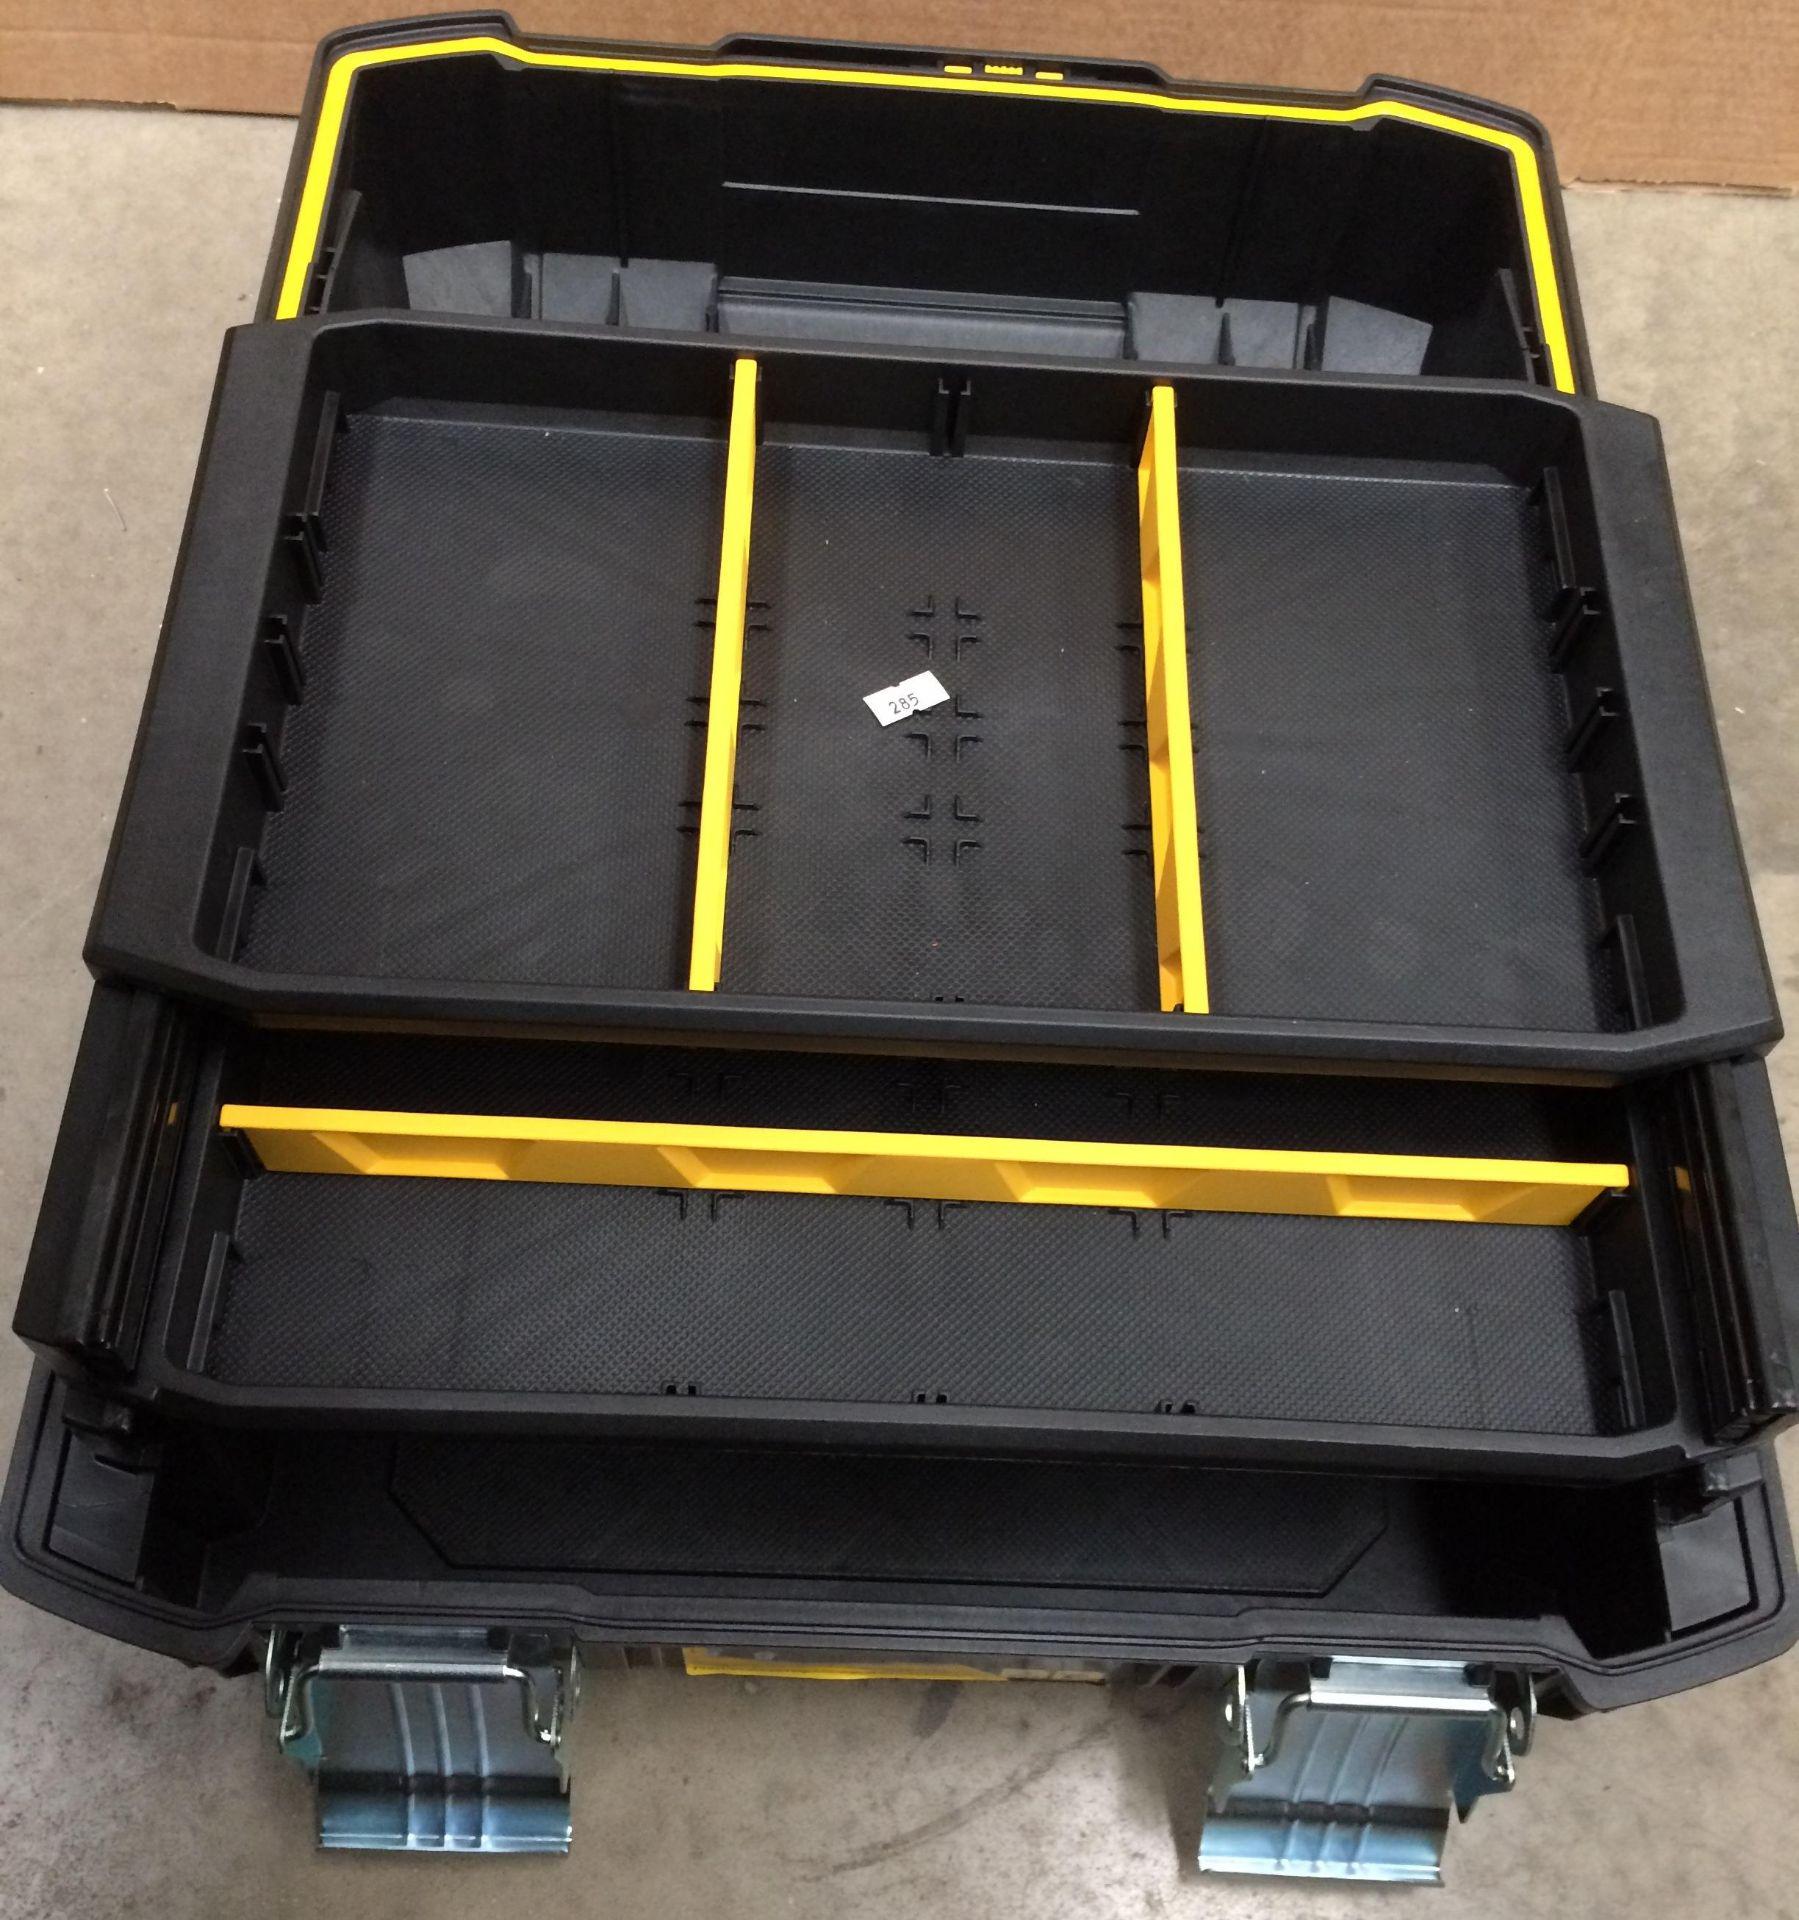 Stanley Fatmax 26cm three level tool box - Image 3 of 3